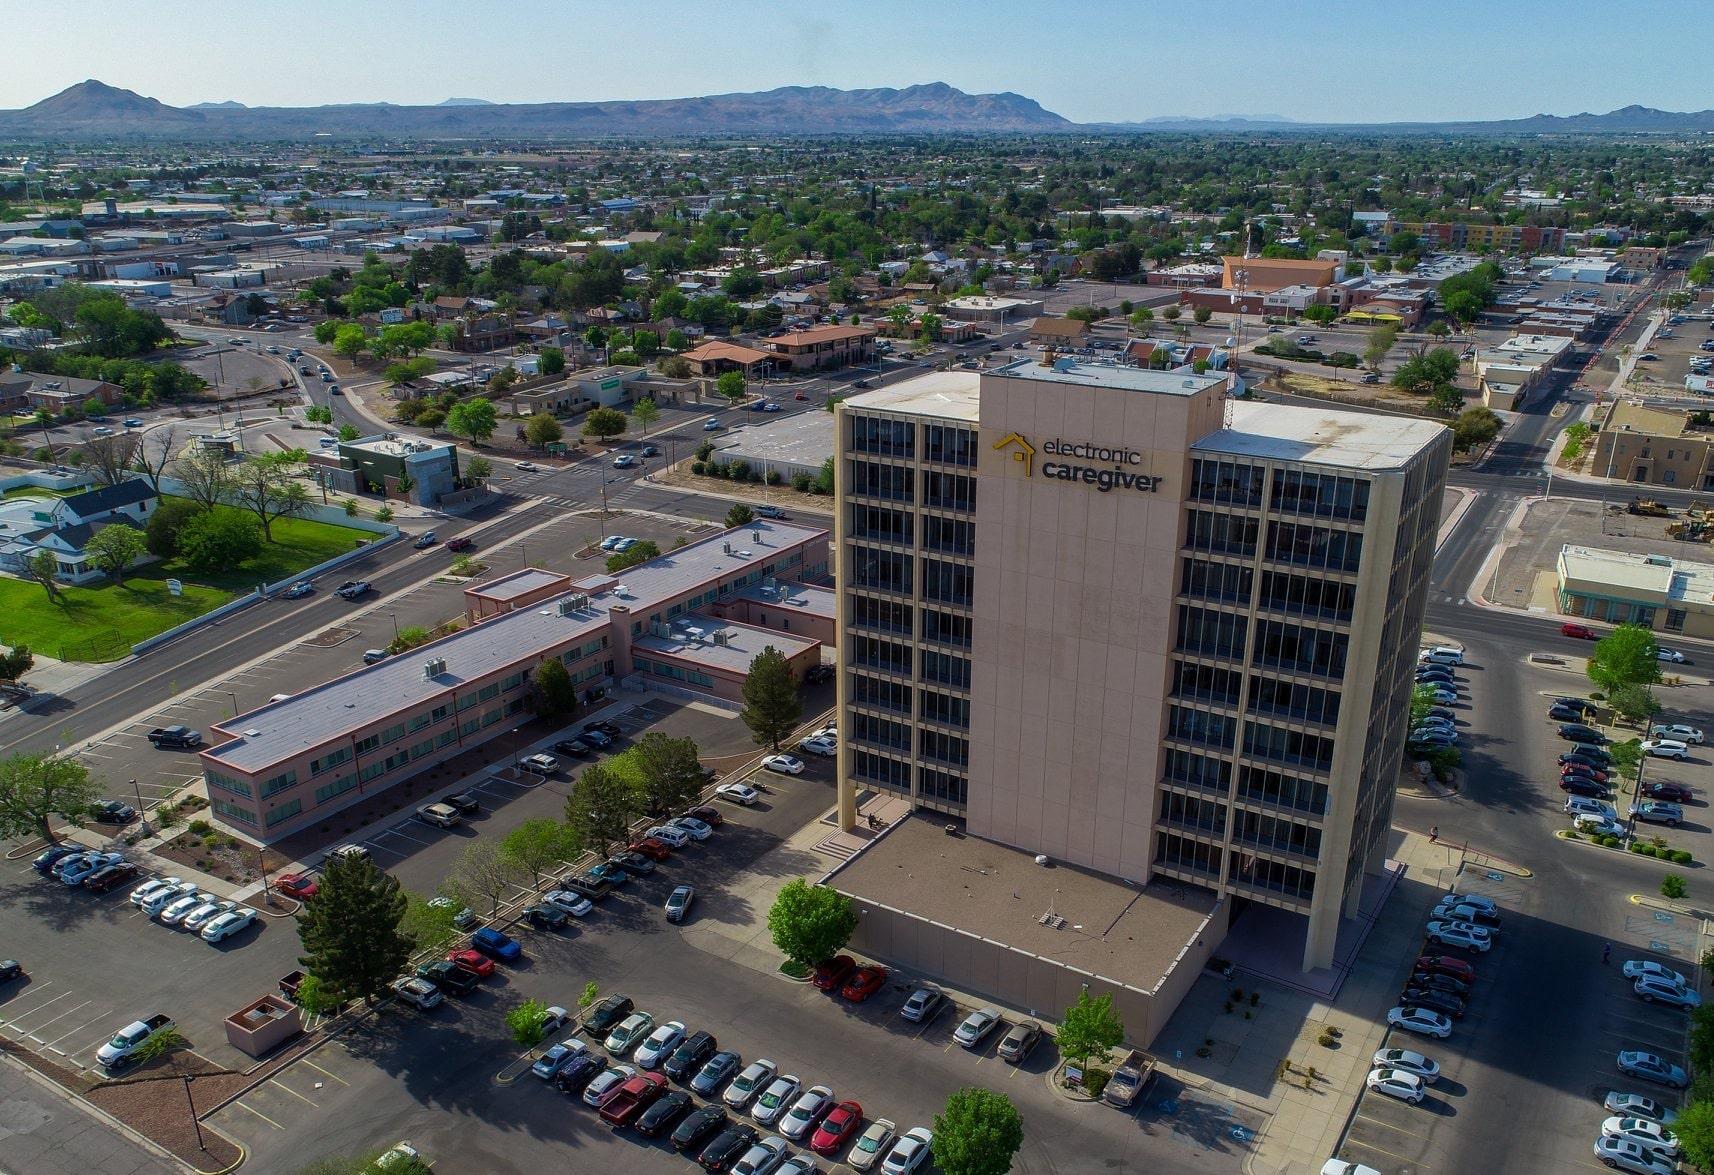 Safari Christian Business Alliance headquarters